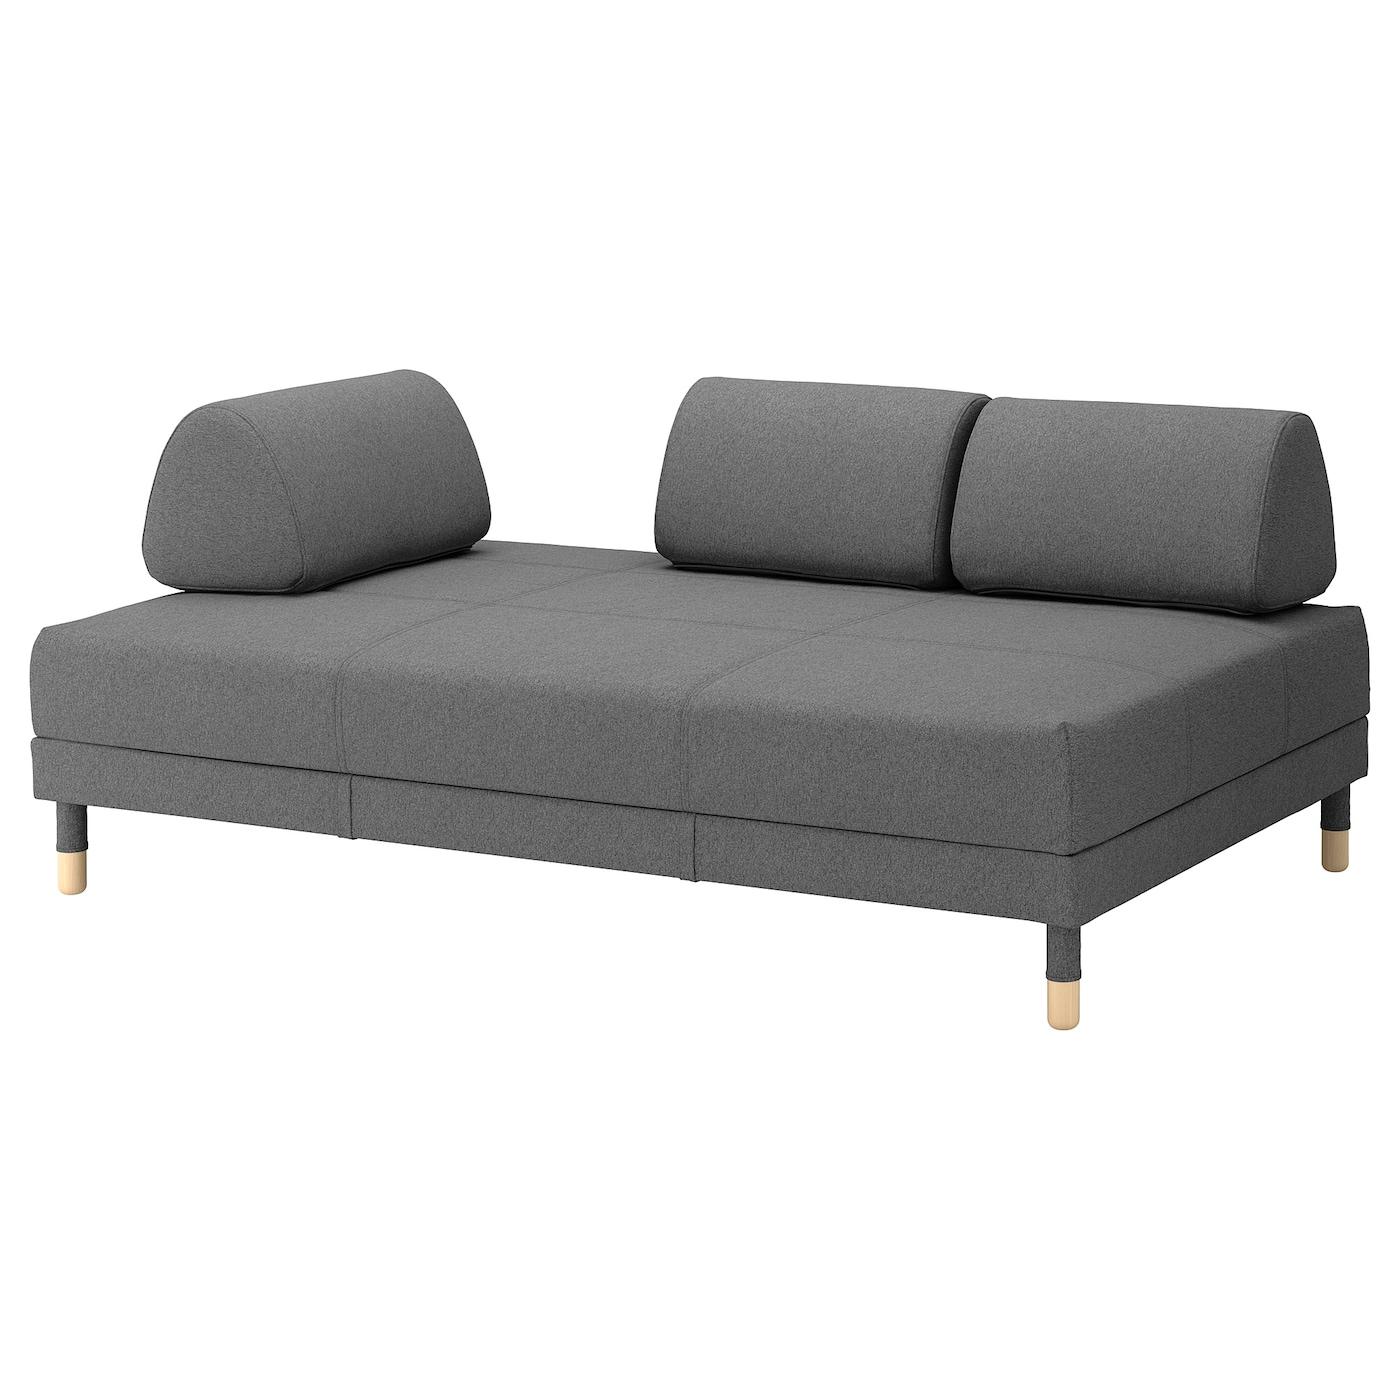 Sofa beds chair beds ikea ireland dublin for Ikea sofa bed 90